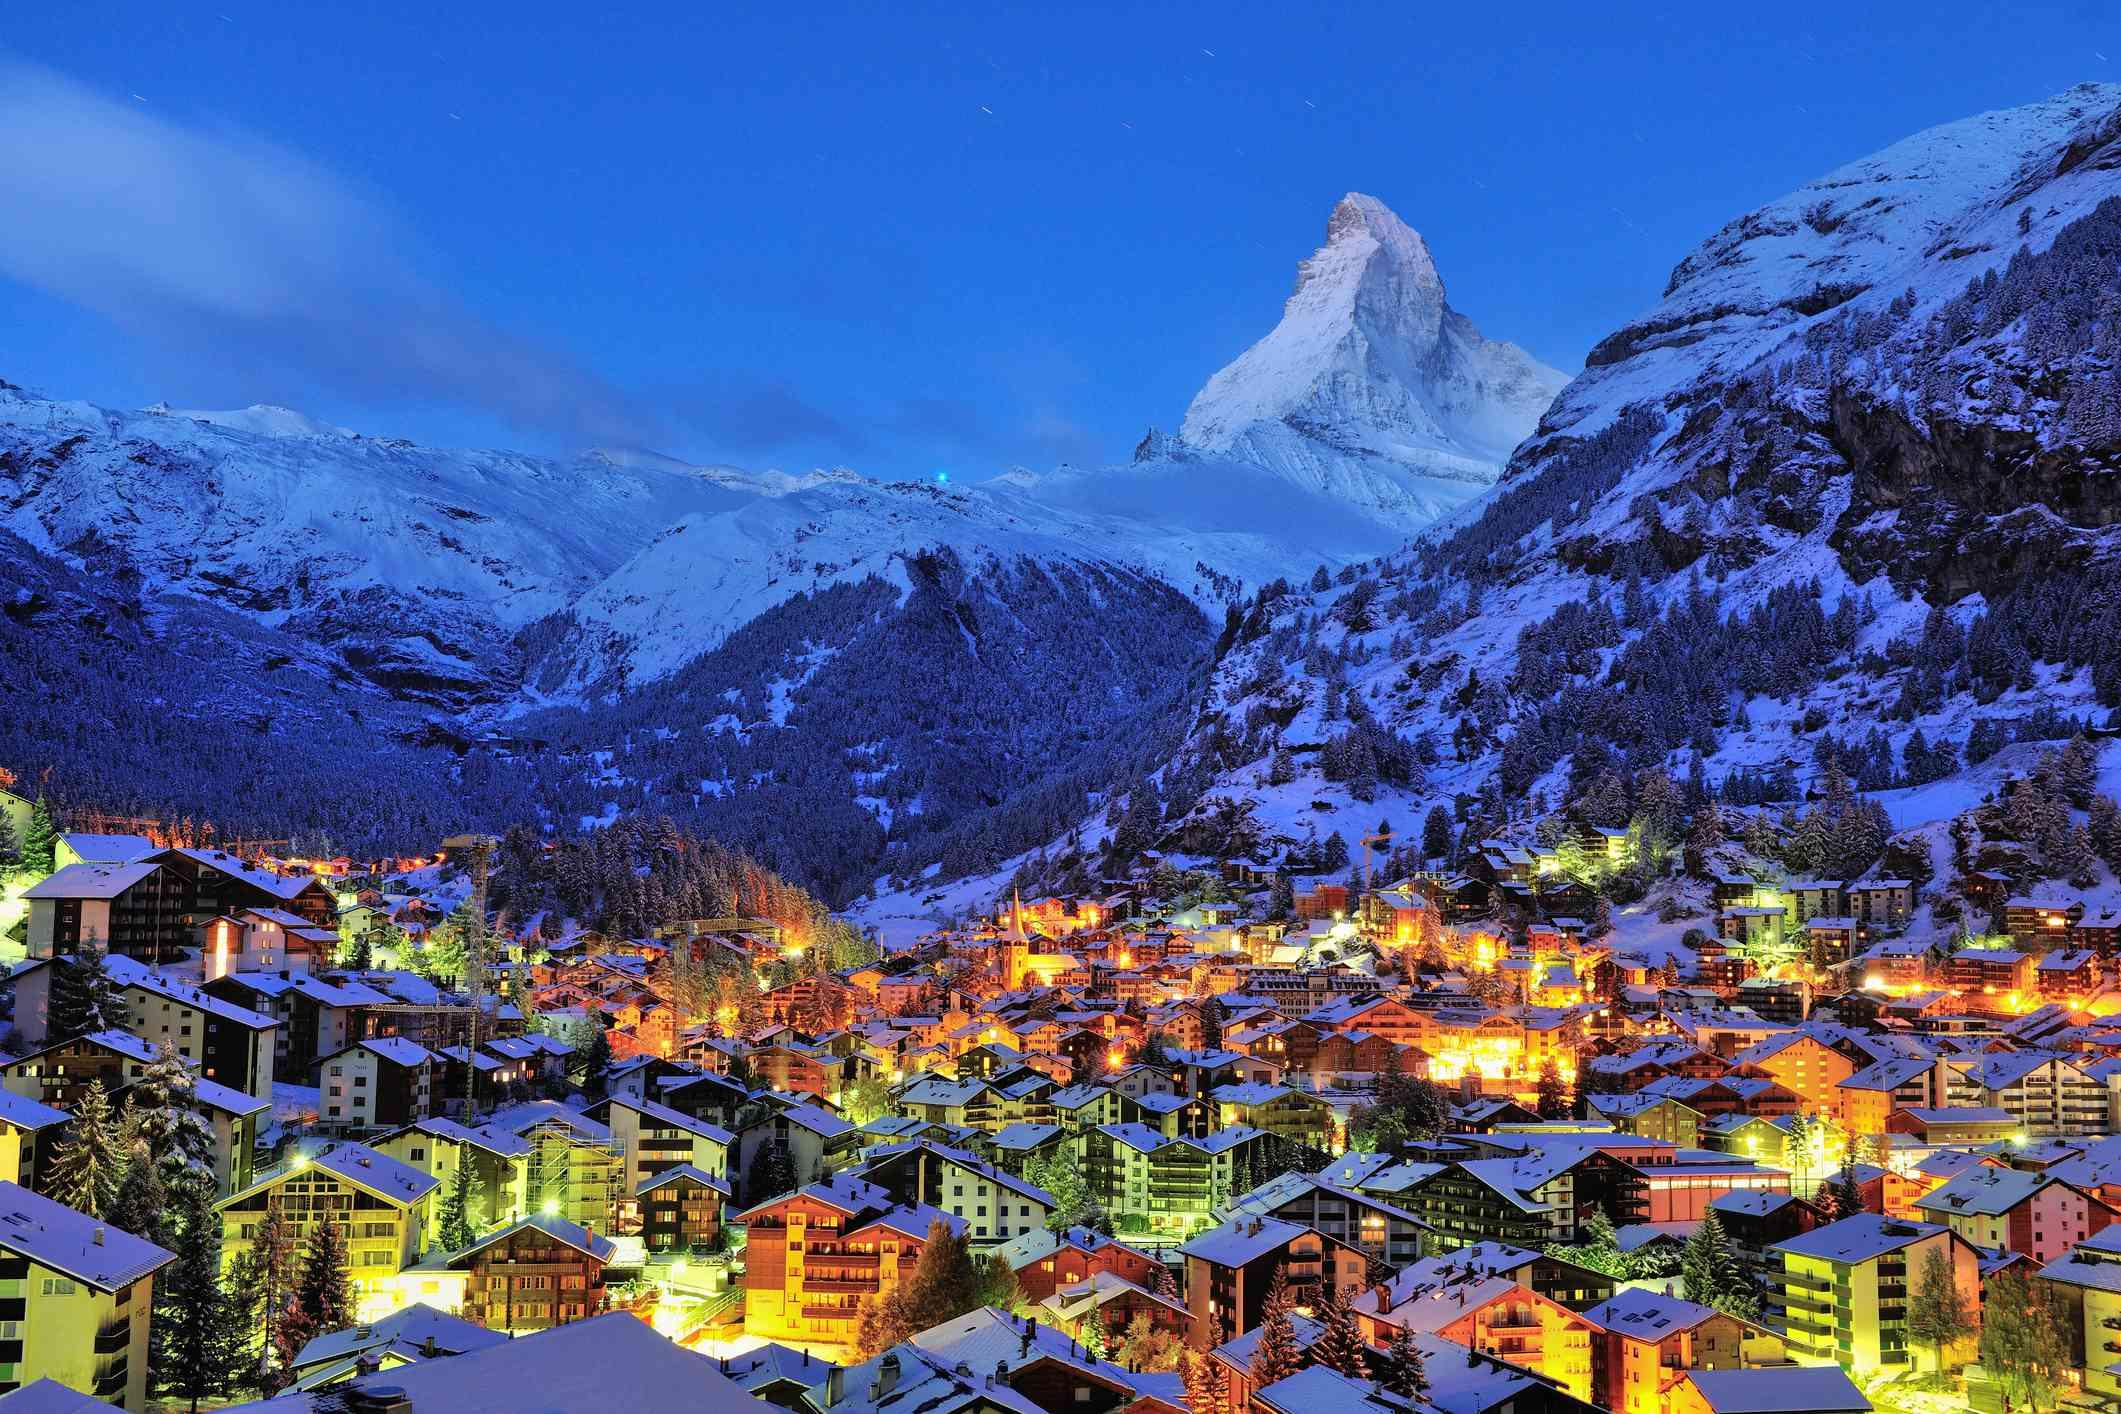 Sunrise over Zermatt, with the Matterhorn in background